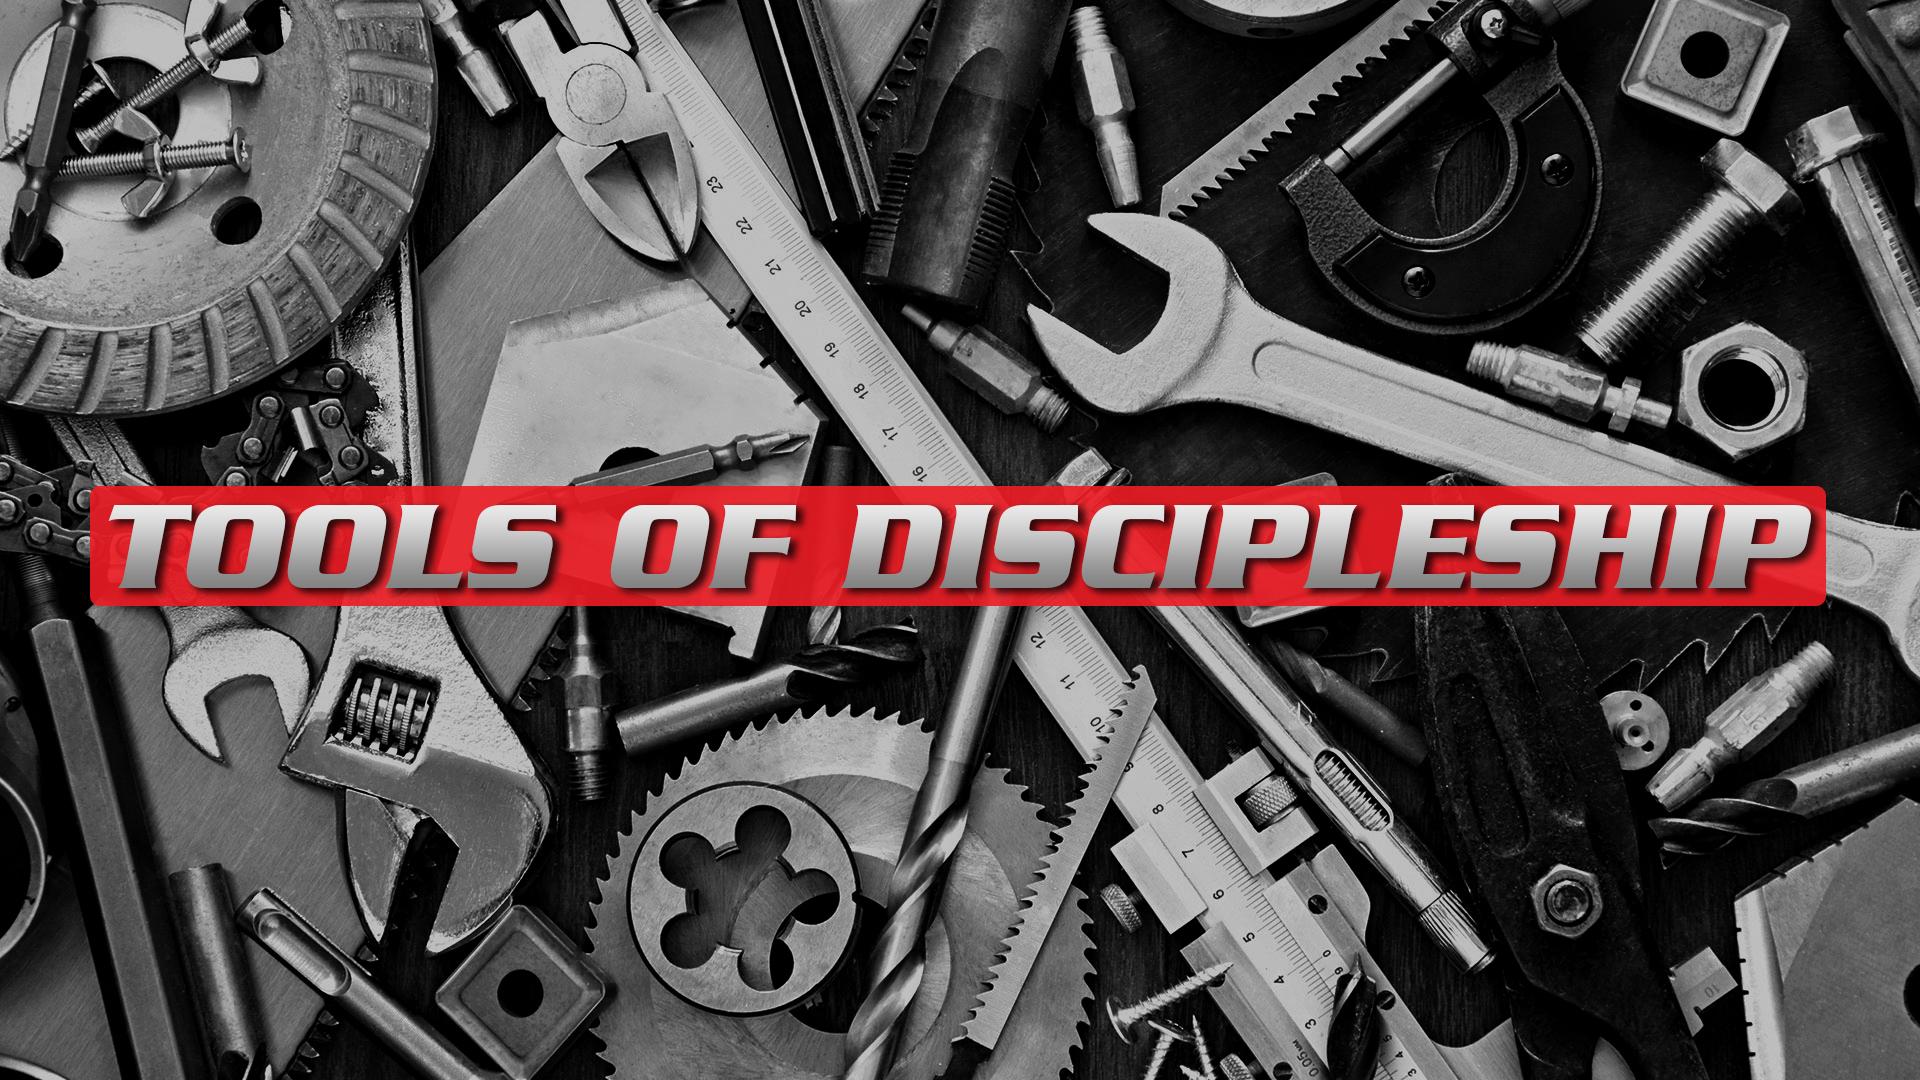 TOOLS-OF-DISCIPLESHIP.jpg